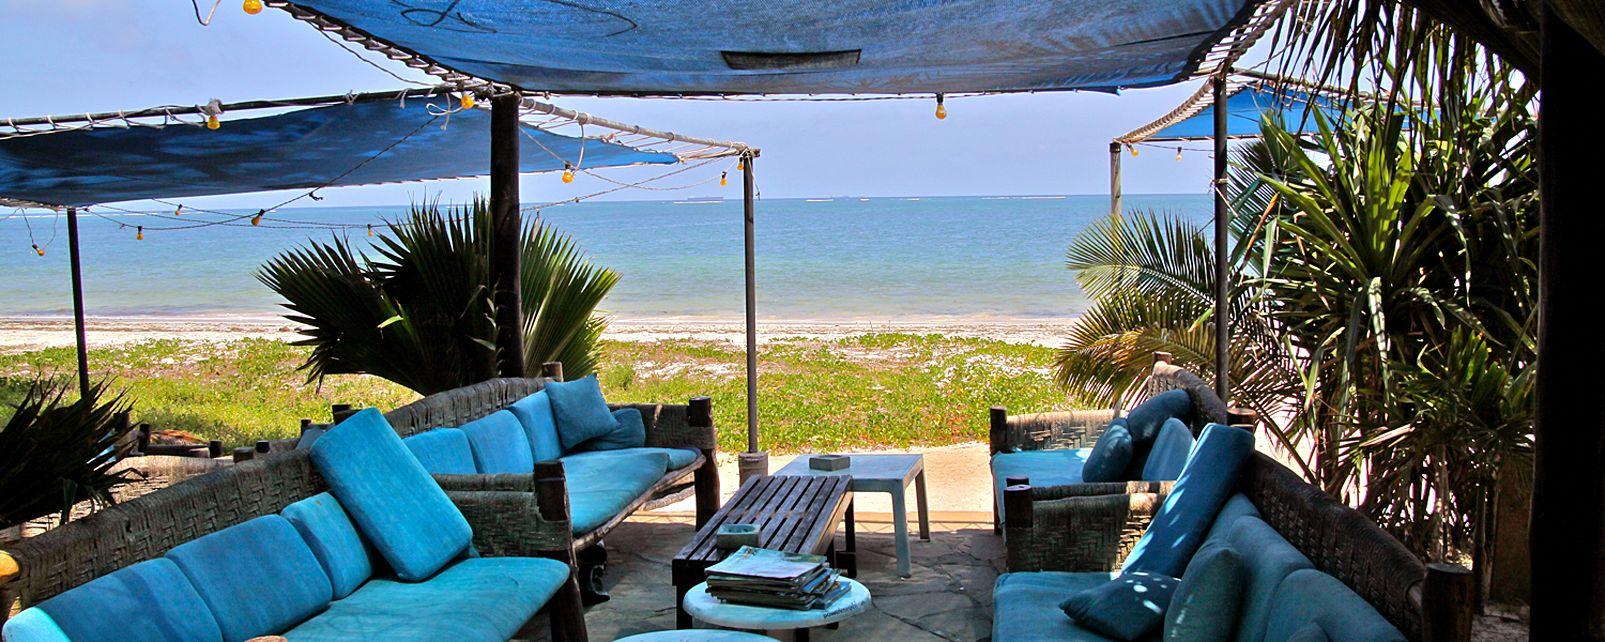 Hotel Nyali International Beach